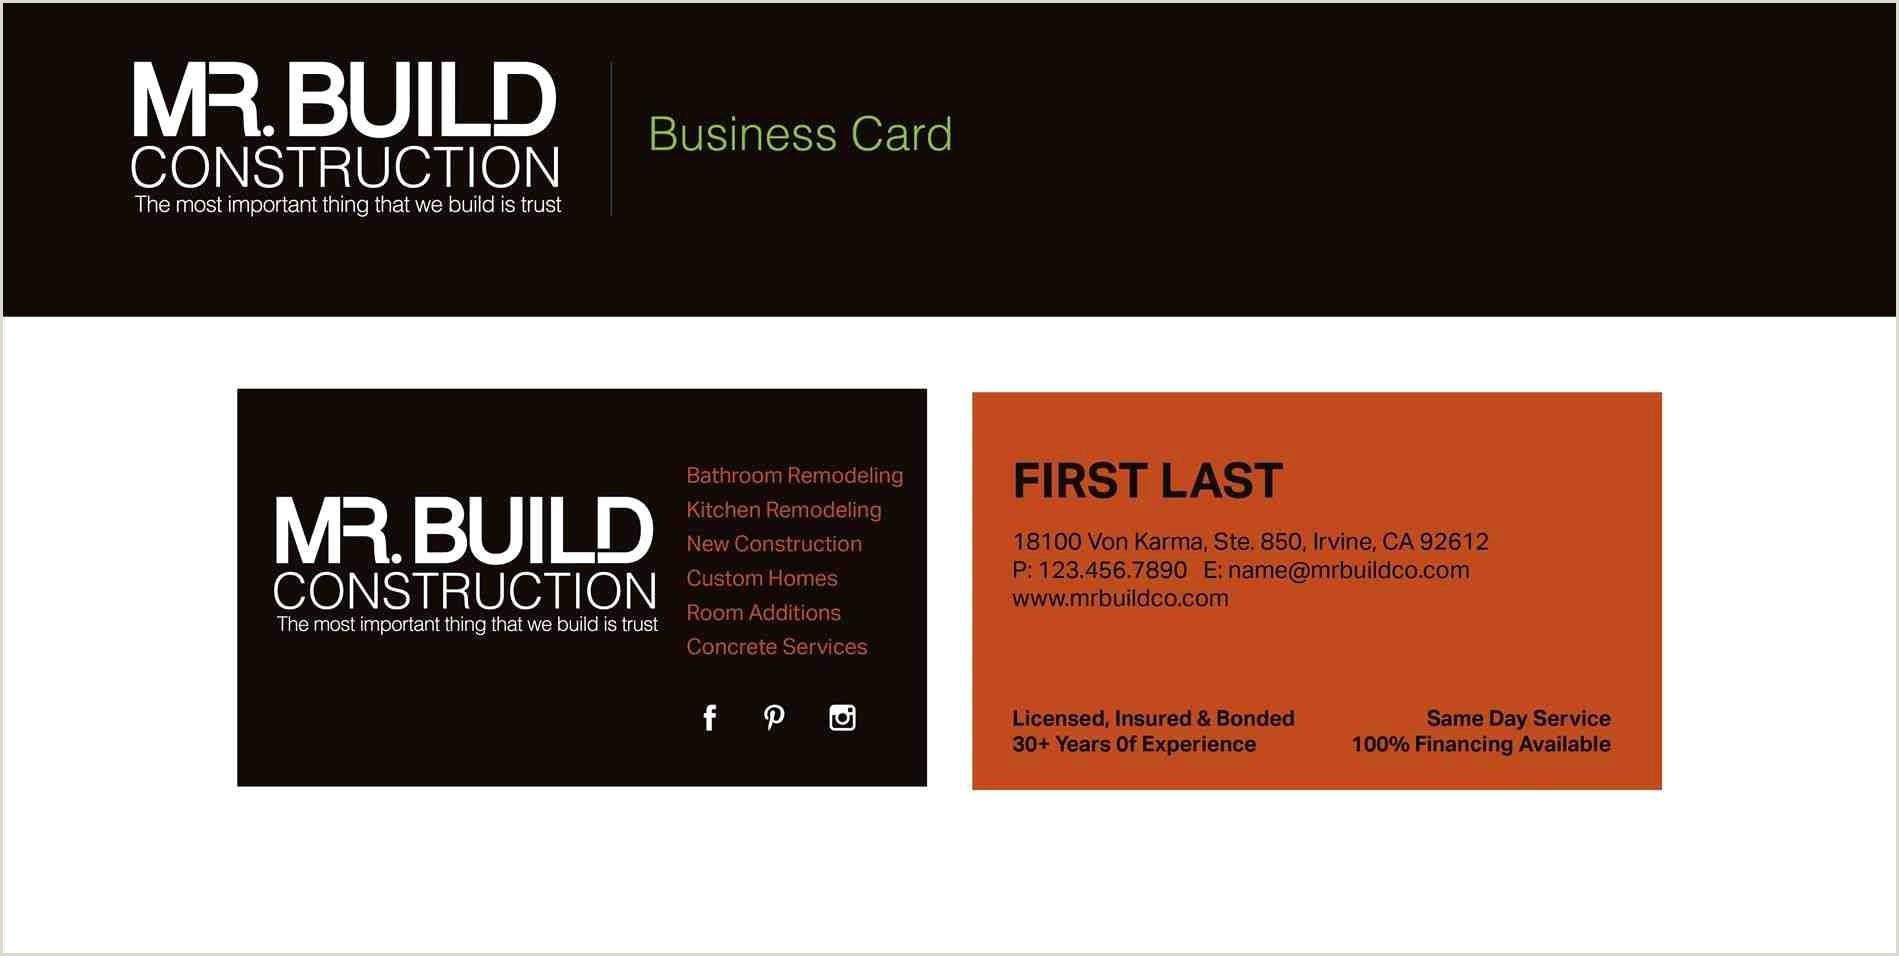 Business Card Website Template 14 Popular Hardwood Flooring Business Card Template